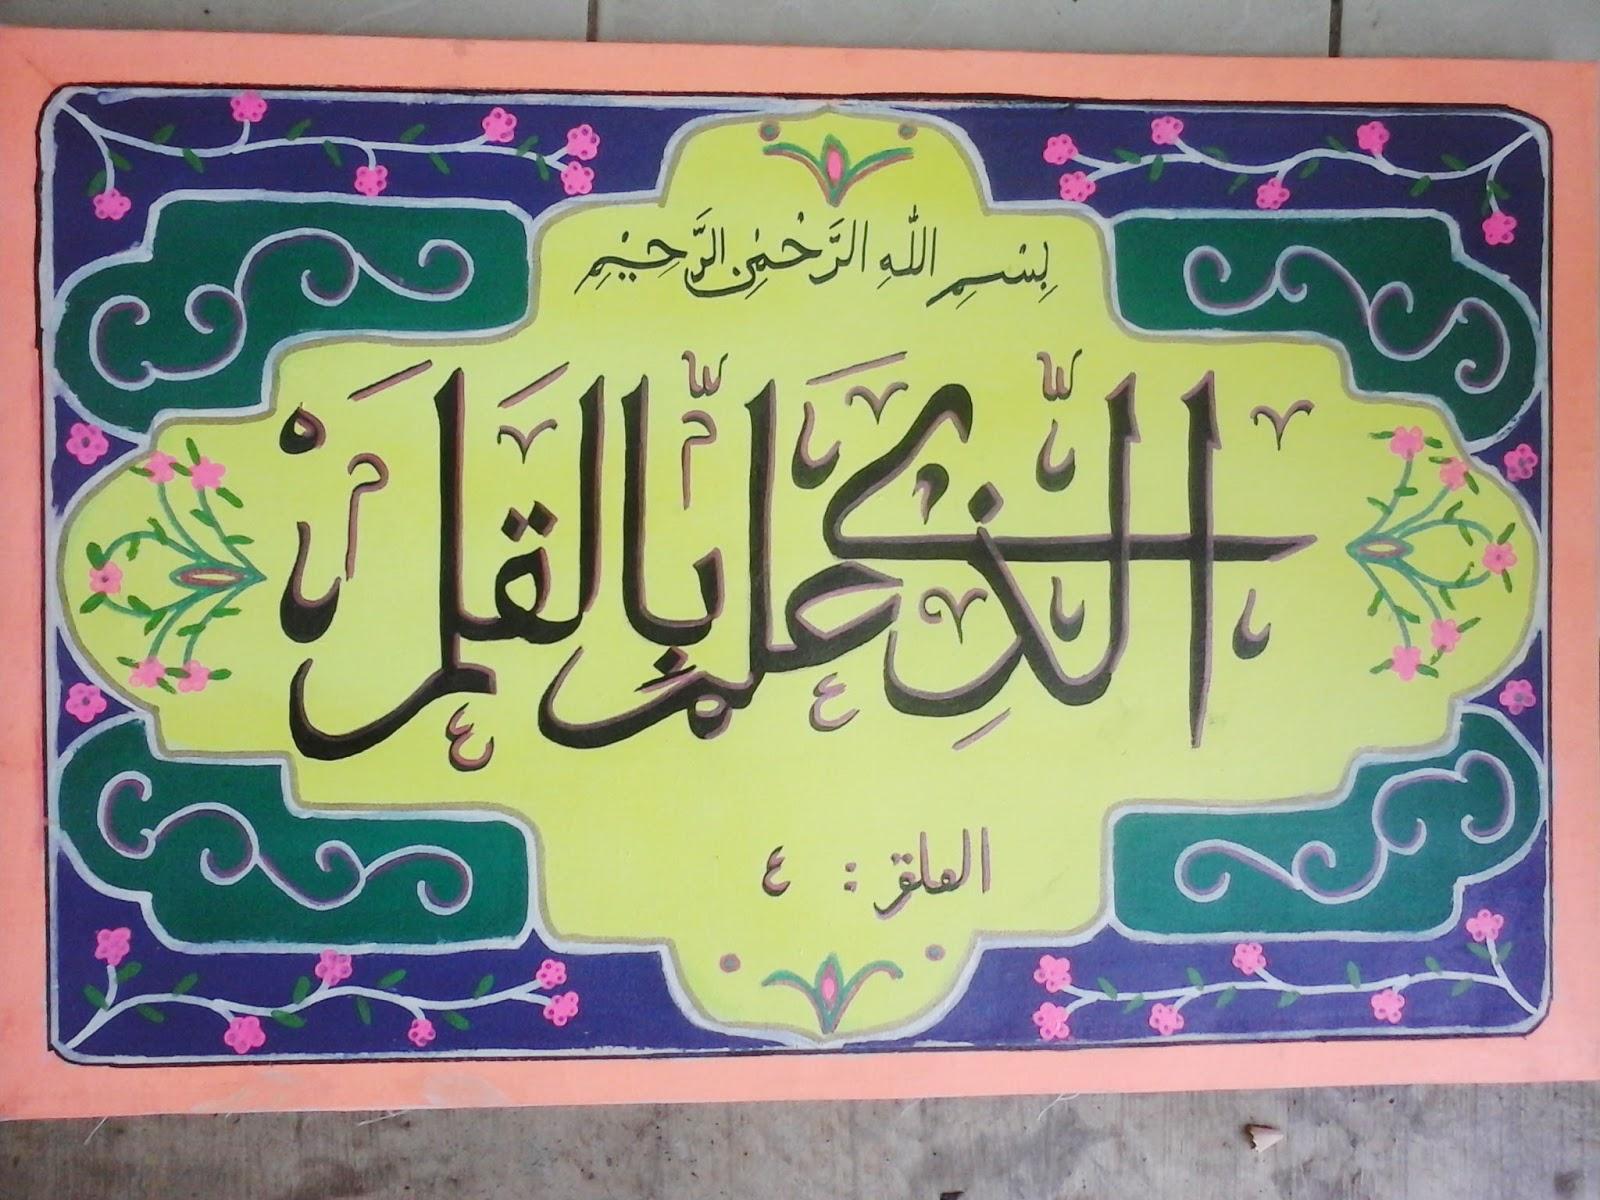 10 Contoh Kaligrafi Terbaik Dalam Lomba Mapsi Sd Rifqi Guru